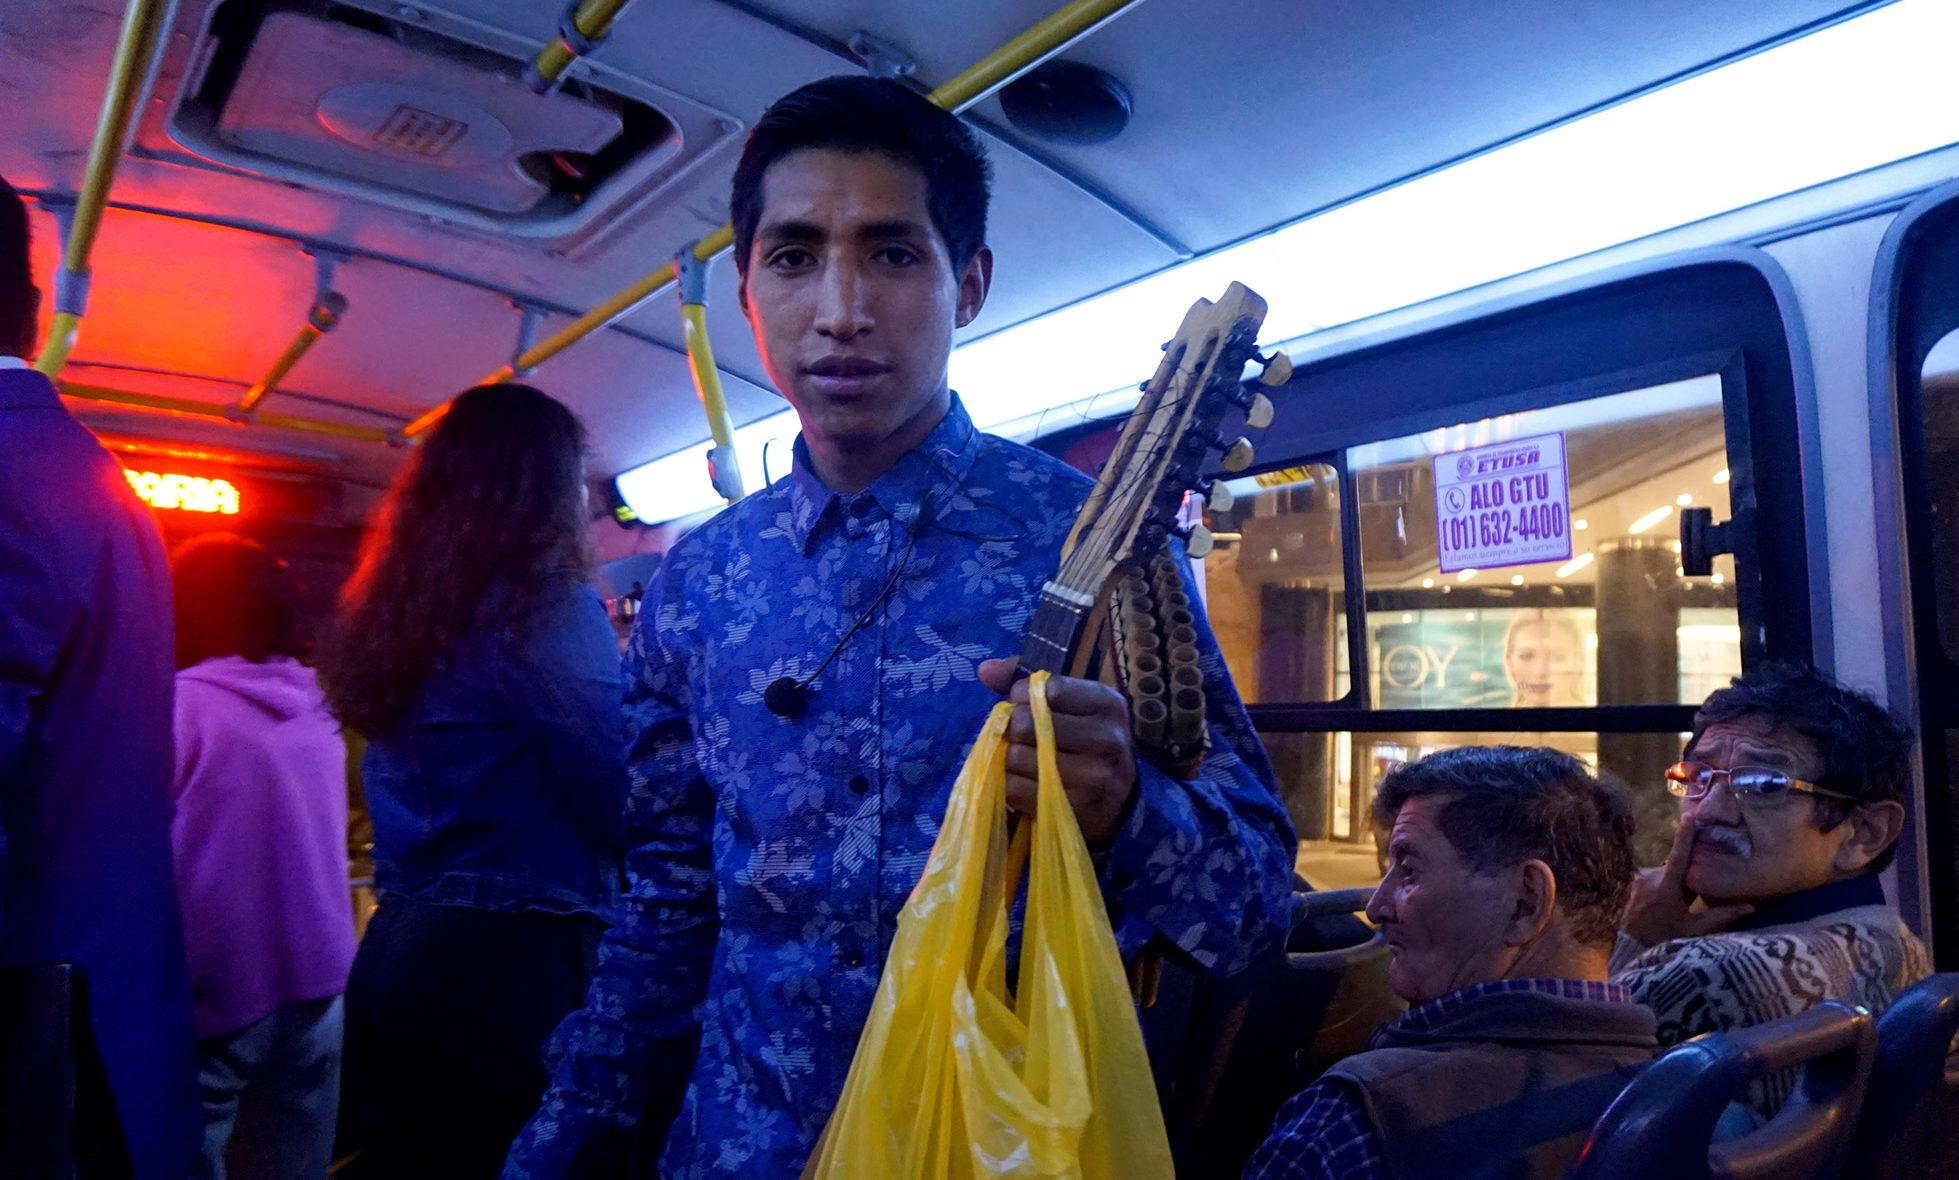 Lima Bus Musician public transport